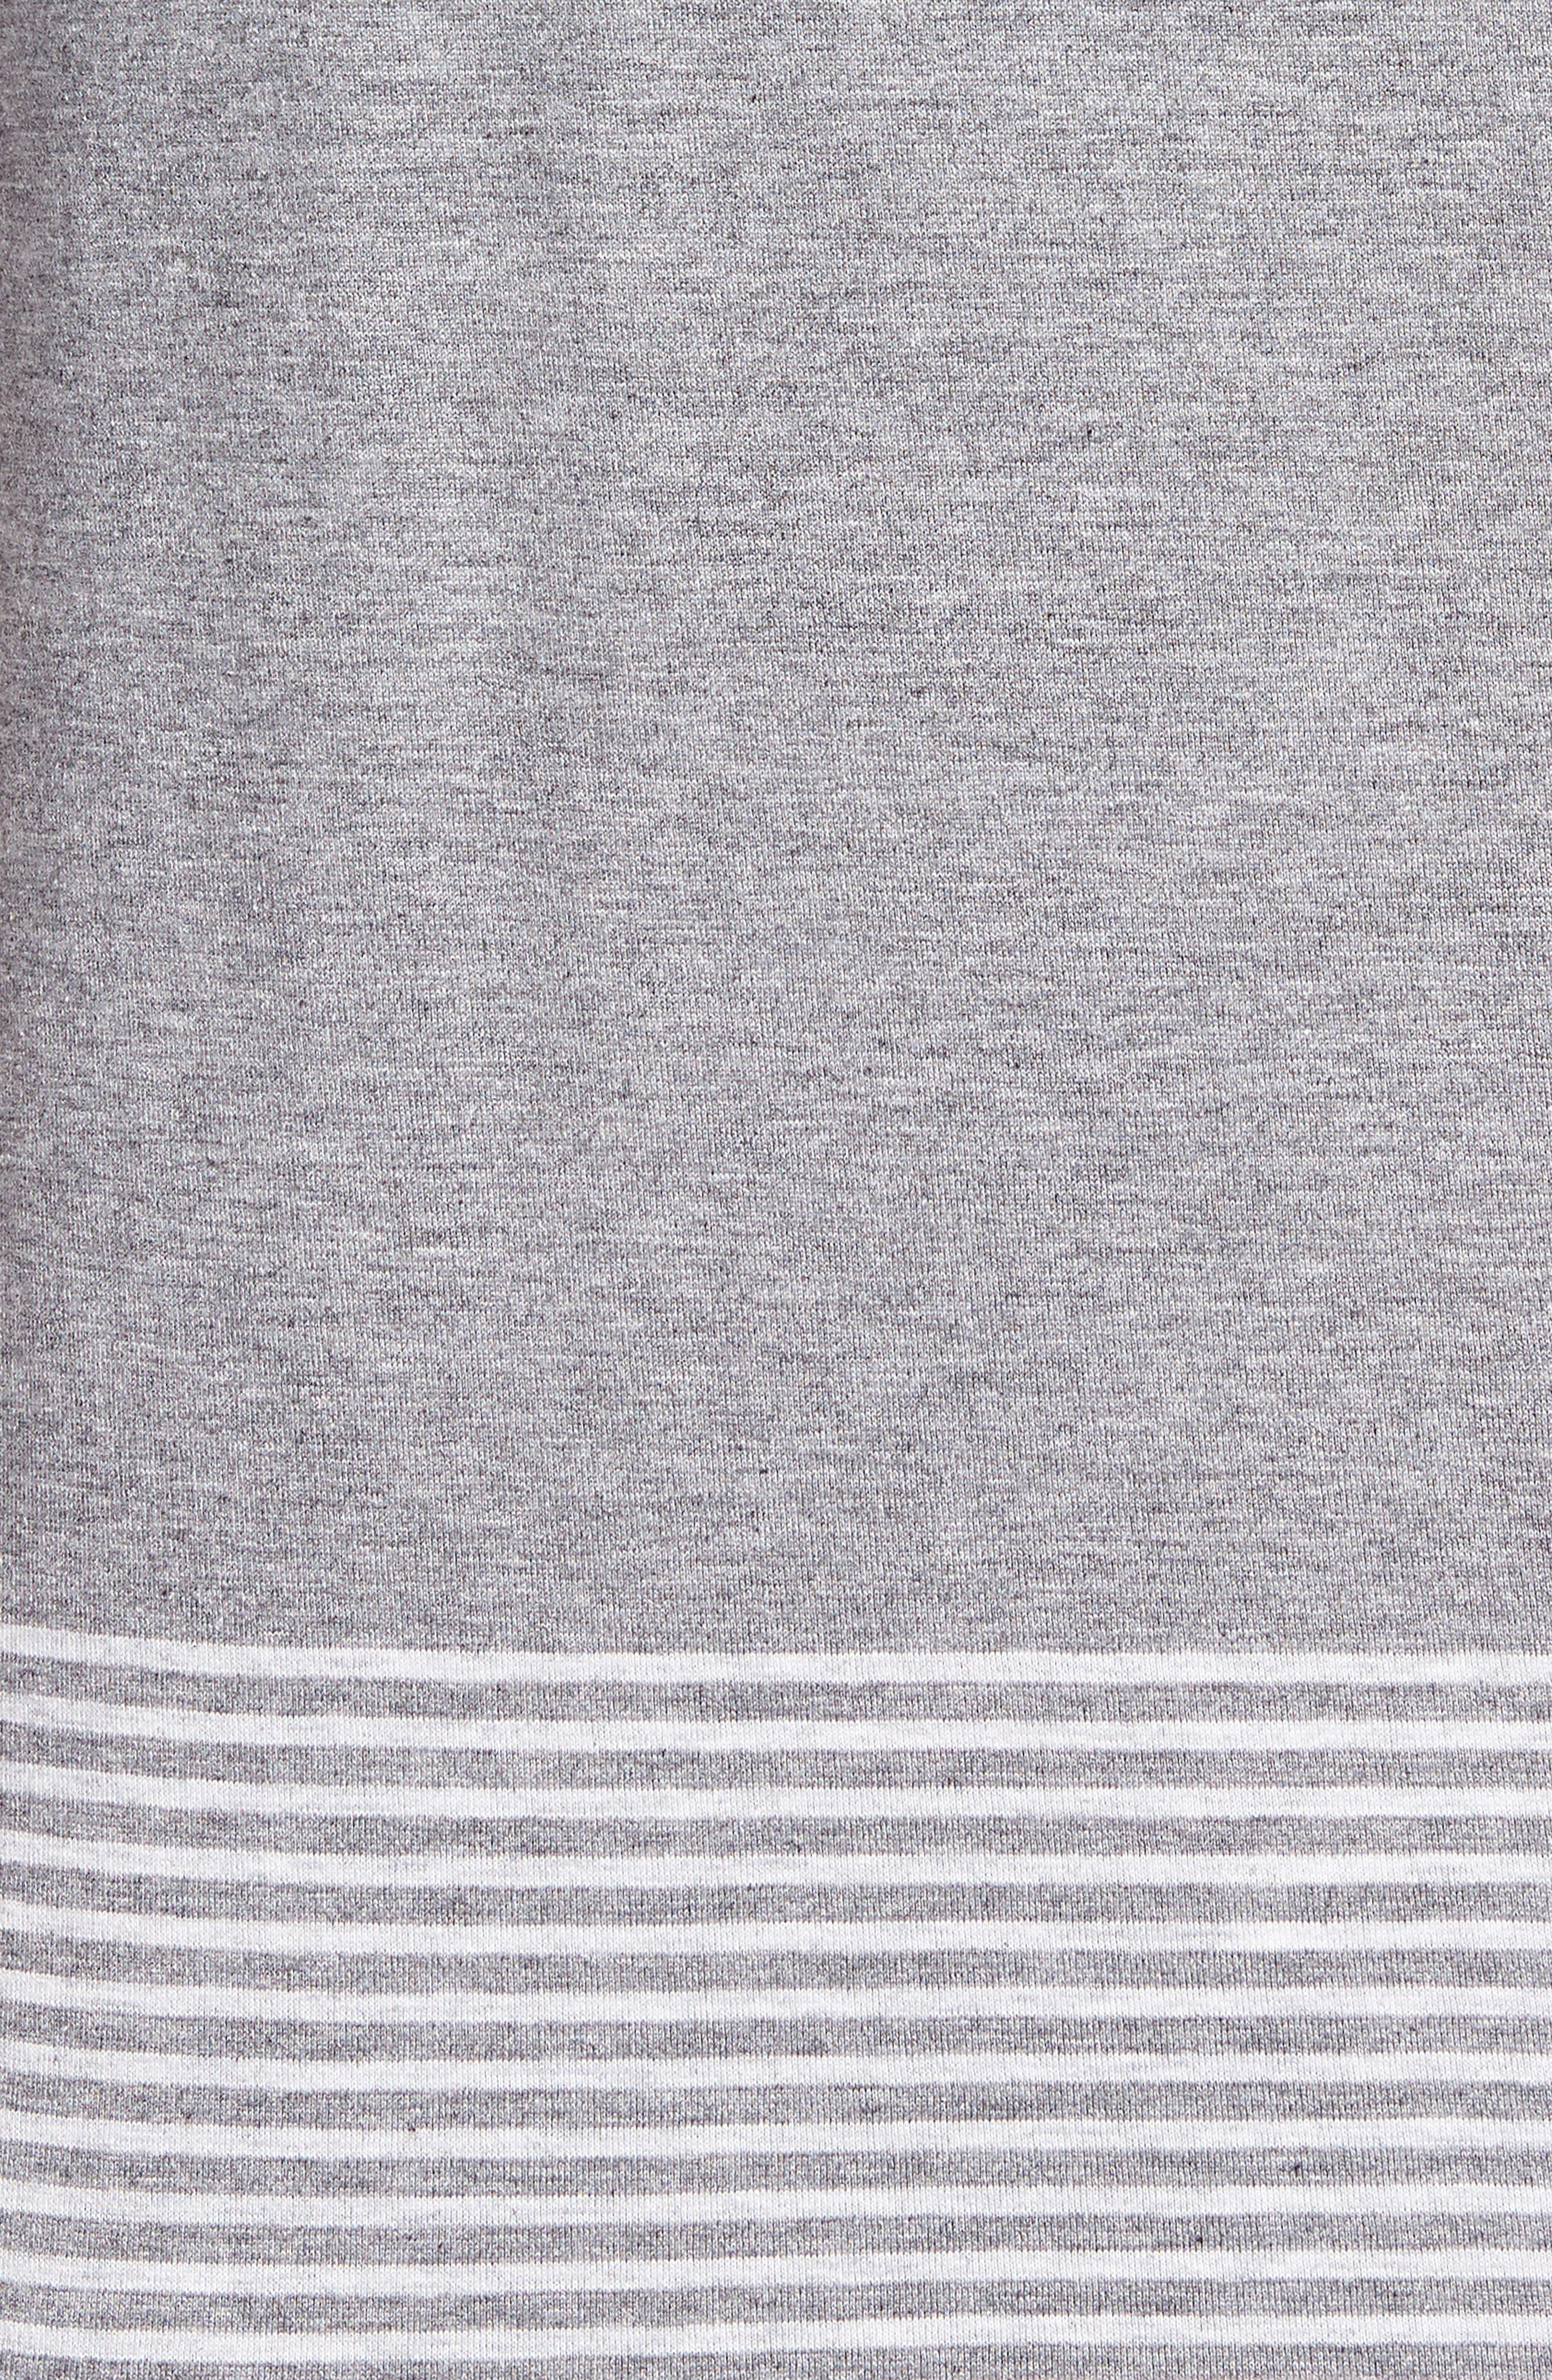 Kramp Colorblock Pocket T-Shirt,                             Alternate thumbnail 5, color,